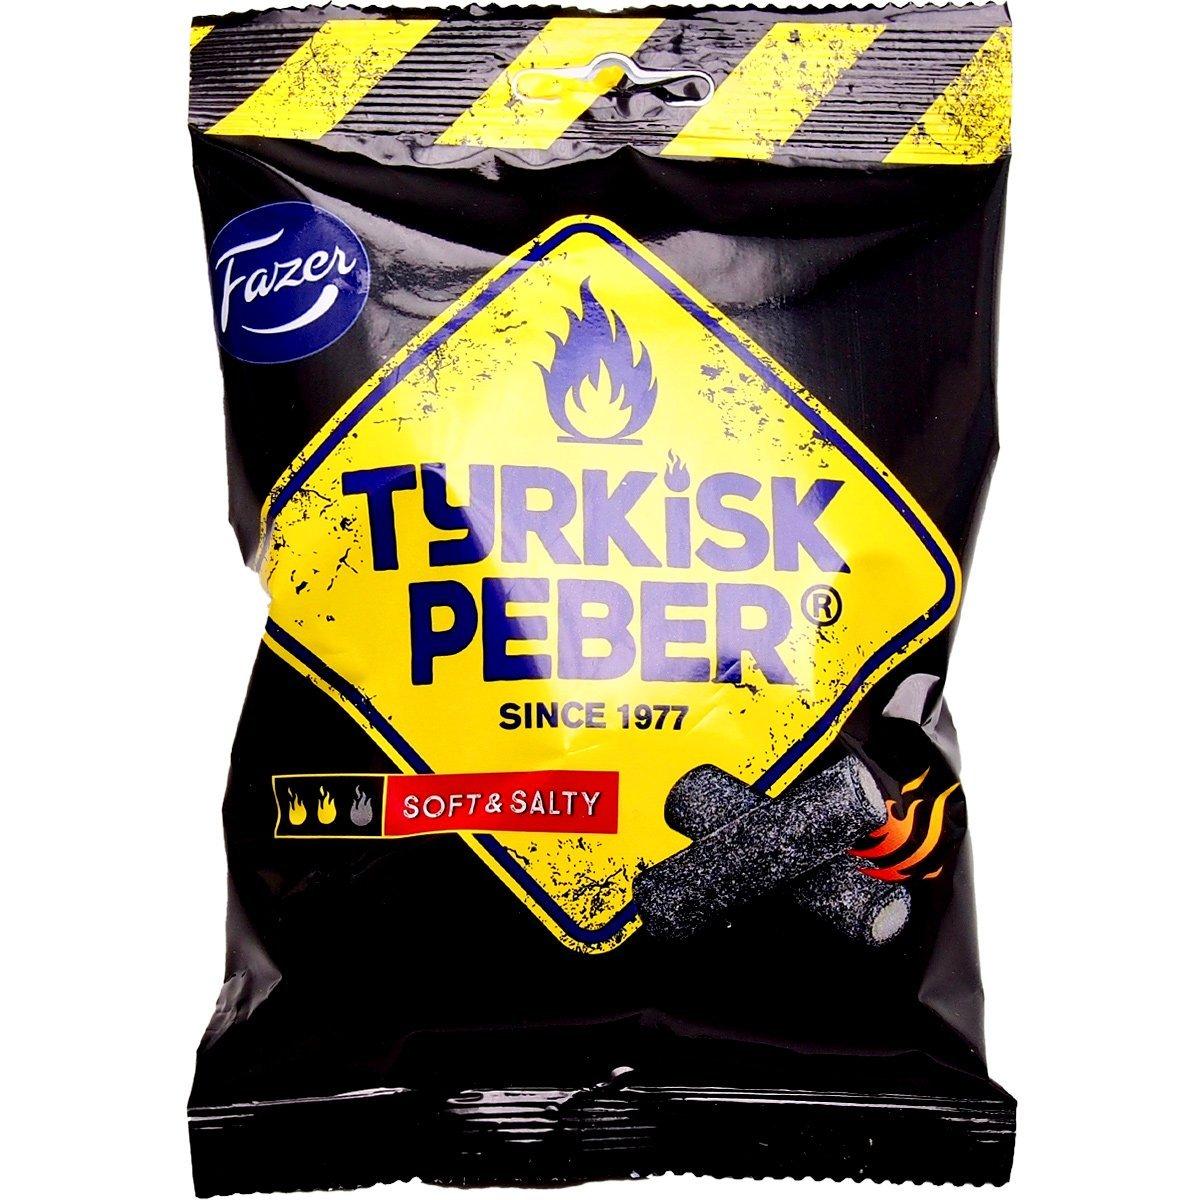 Fazer Tyrkisk Peber Soft & Salty (120g) 1